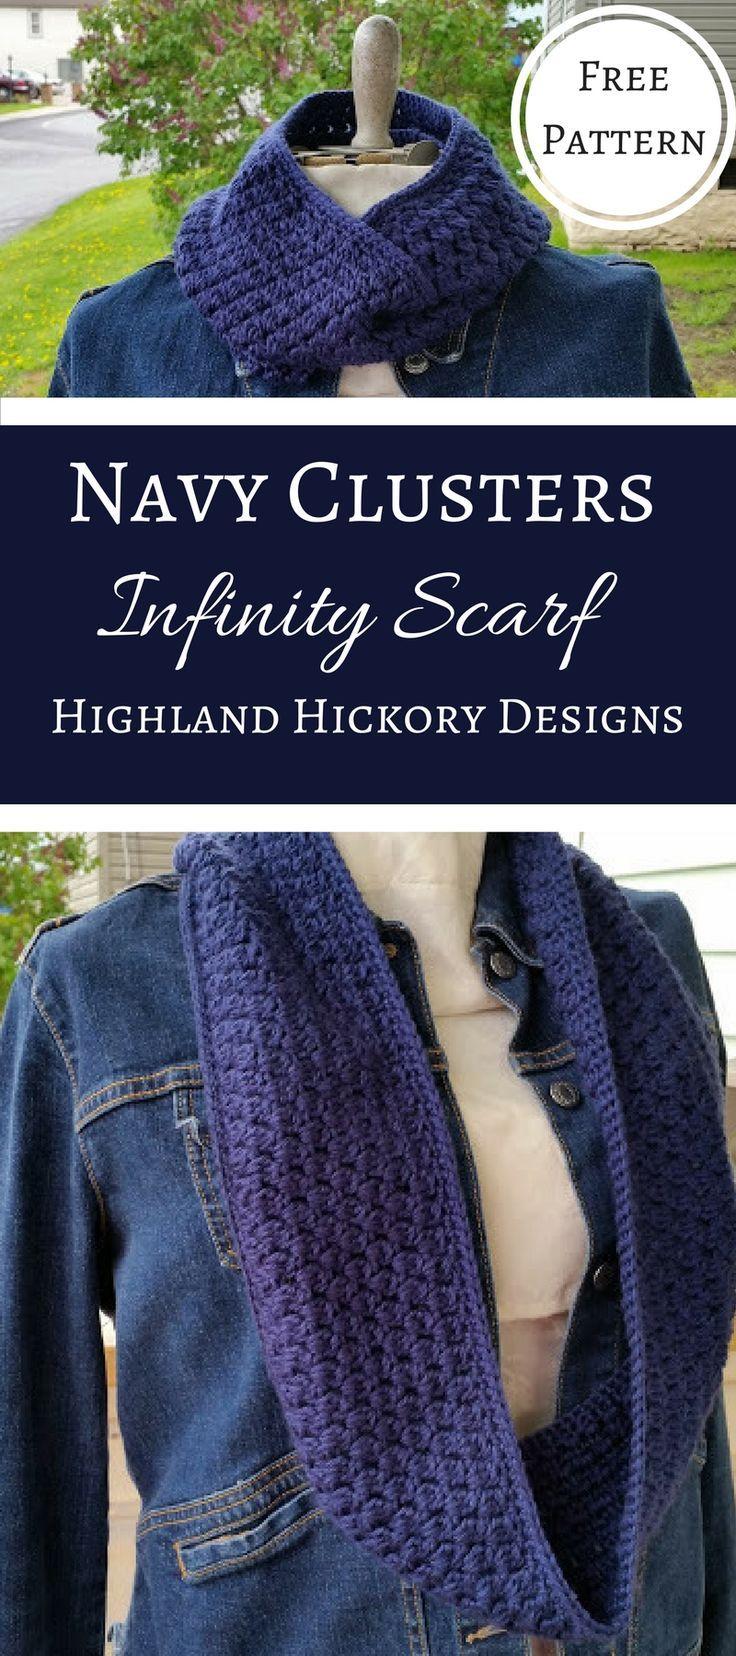 Navy Clusters Infinity Scarf Free Crochet Pattern | Pinterest ...